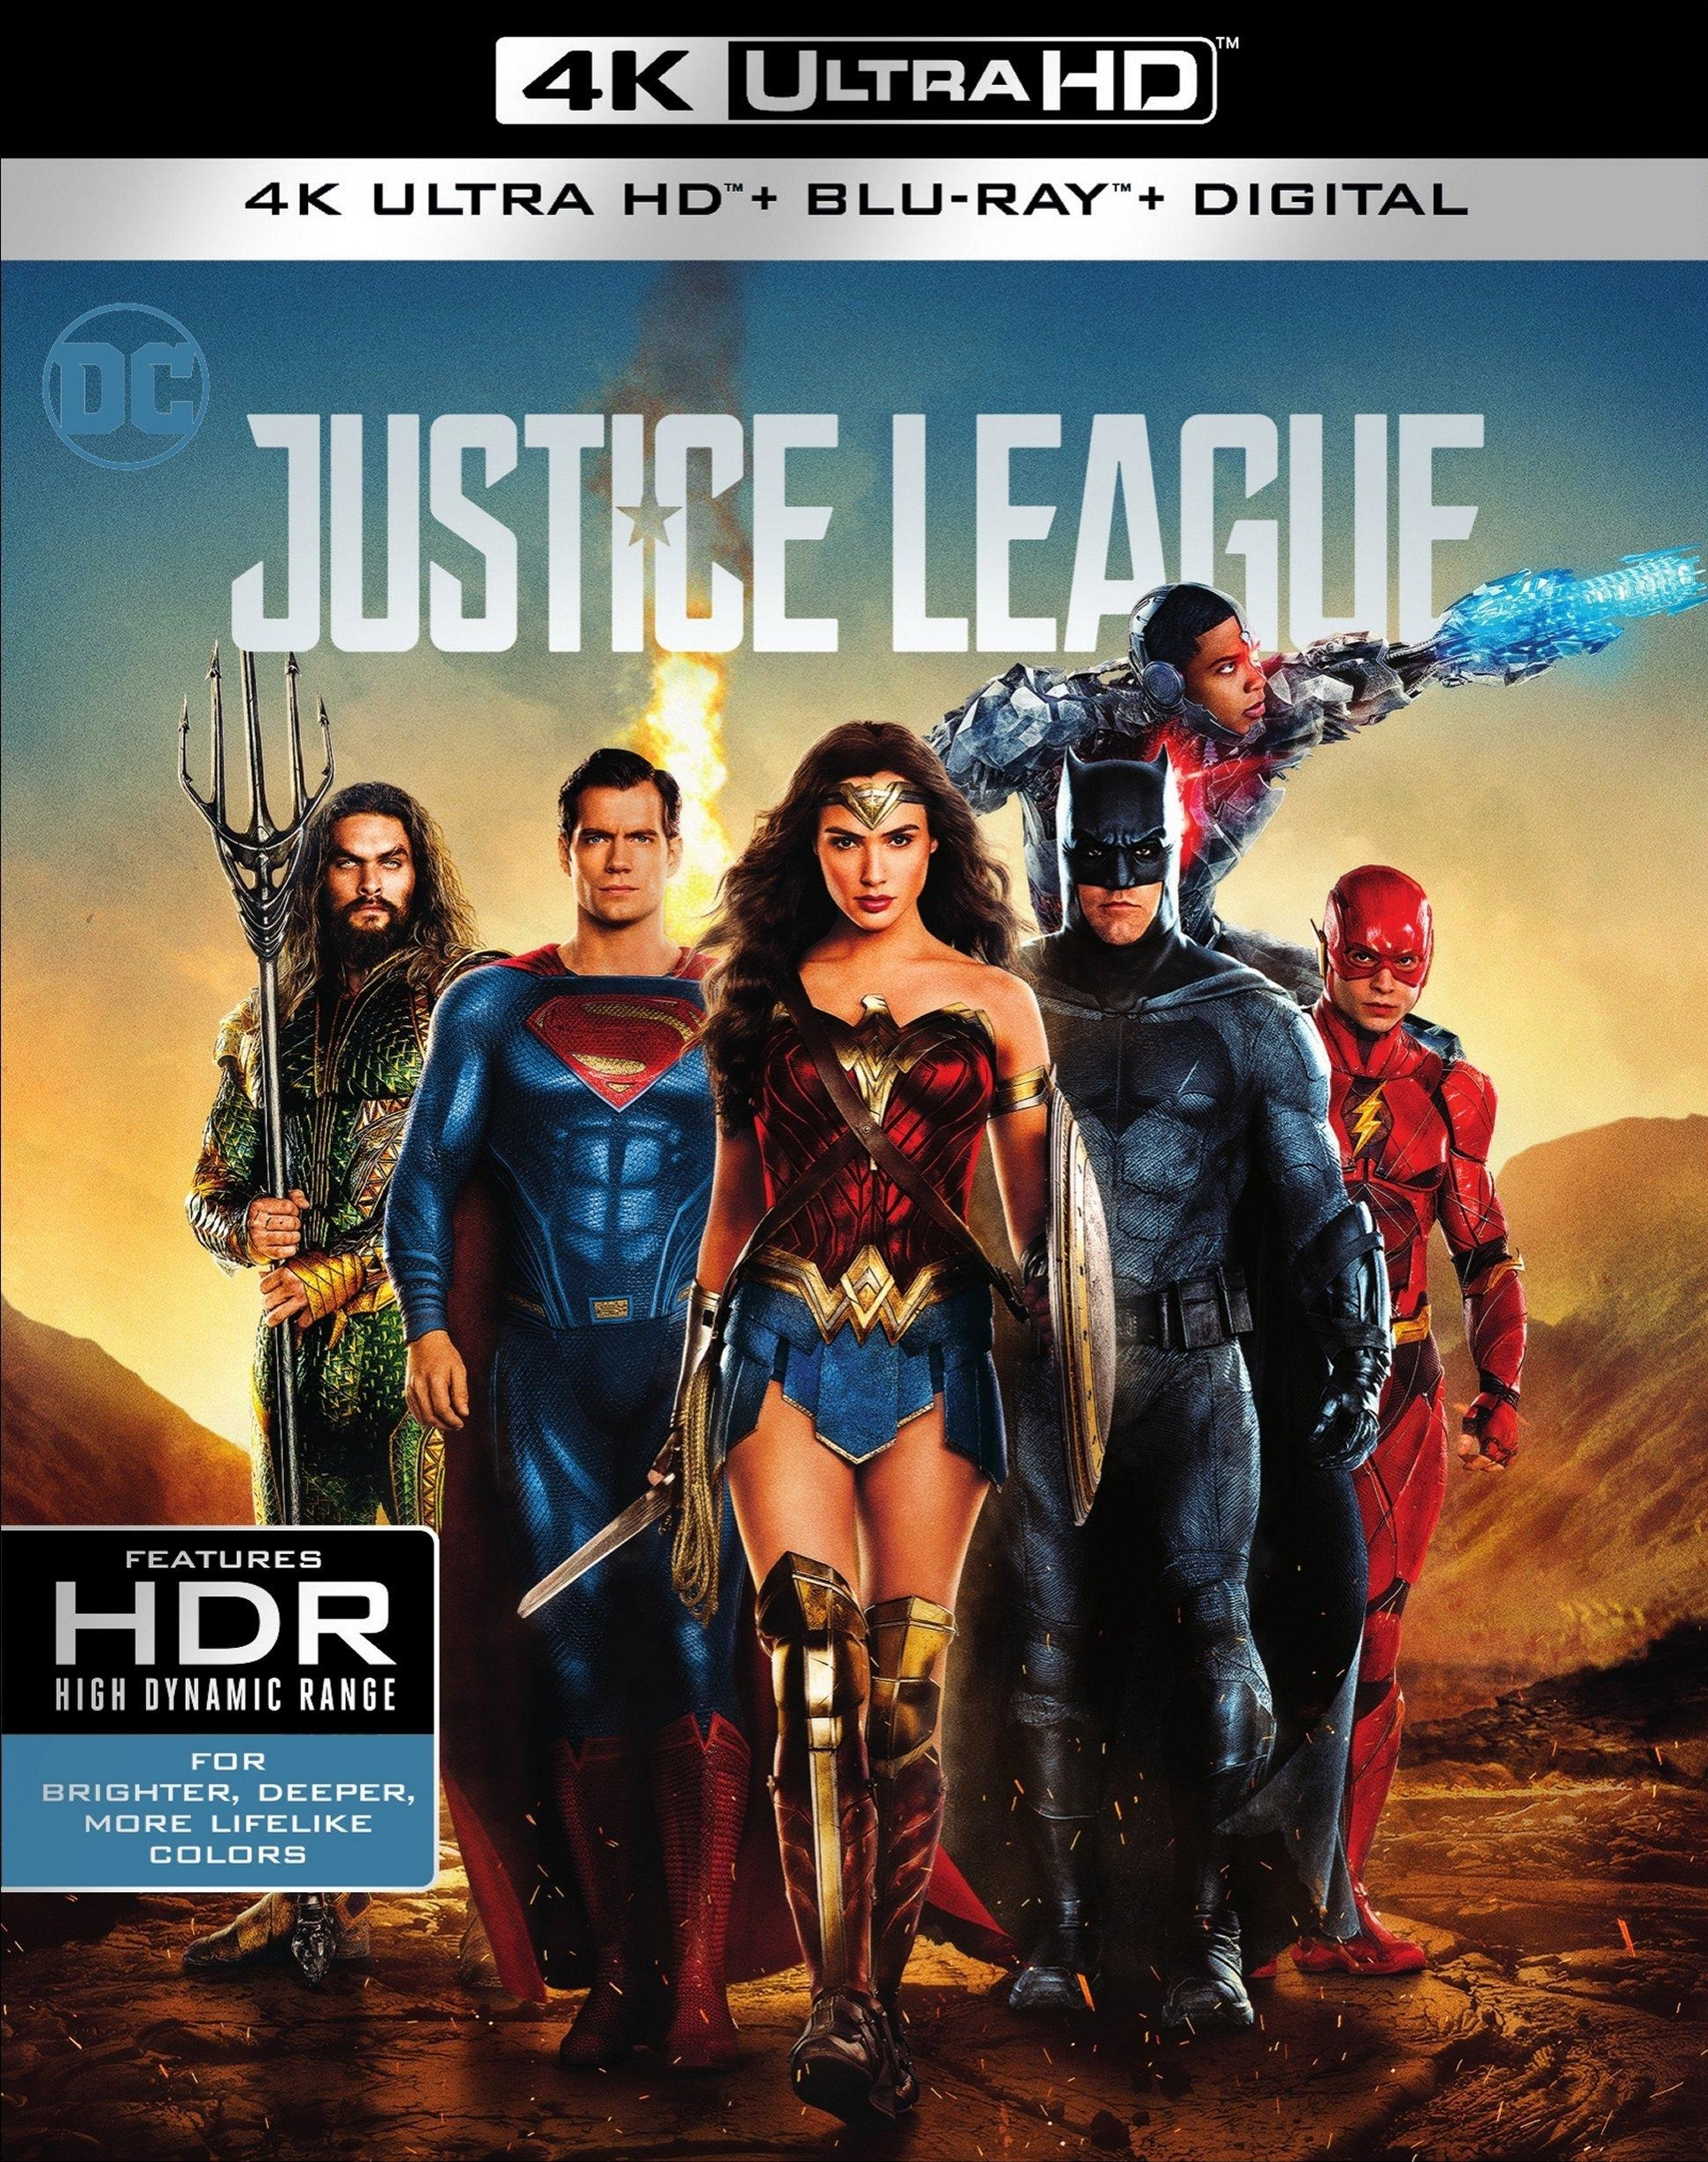 Justice League 4K (2017) UHD Ultra HD Blu-ray